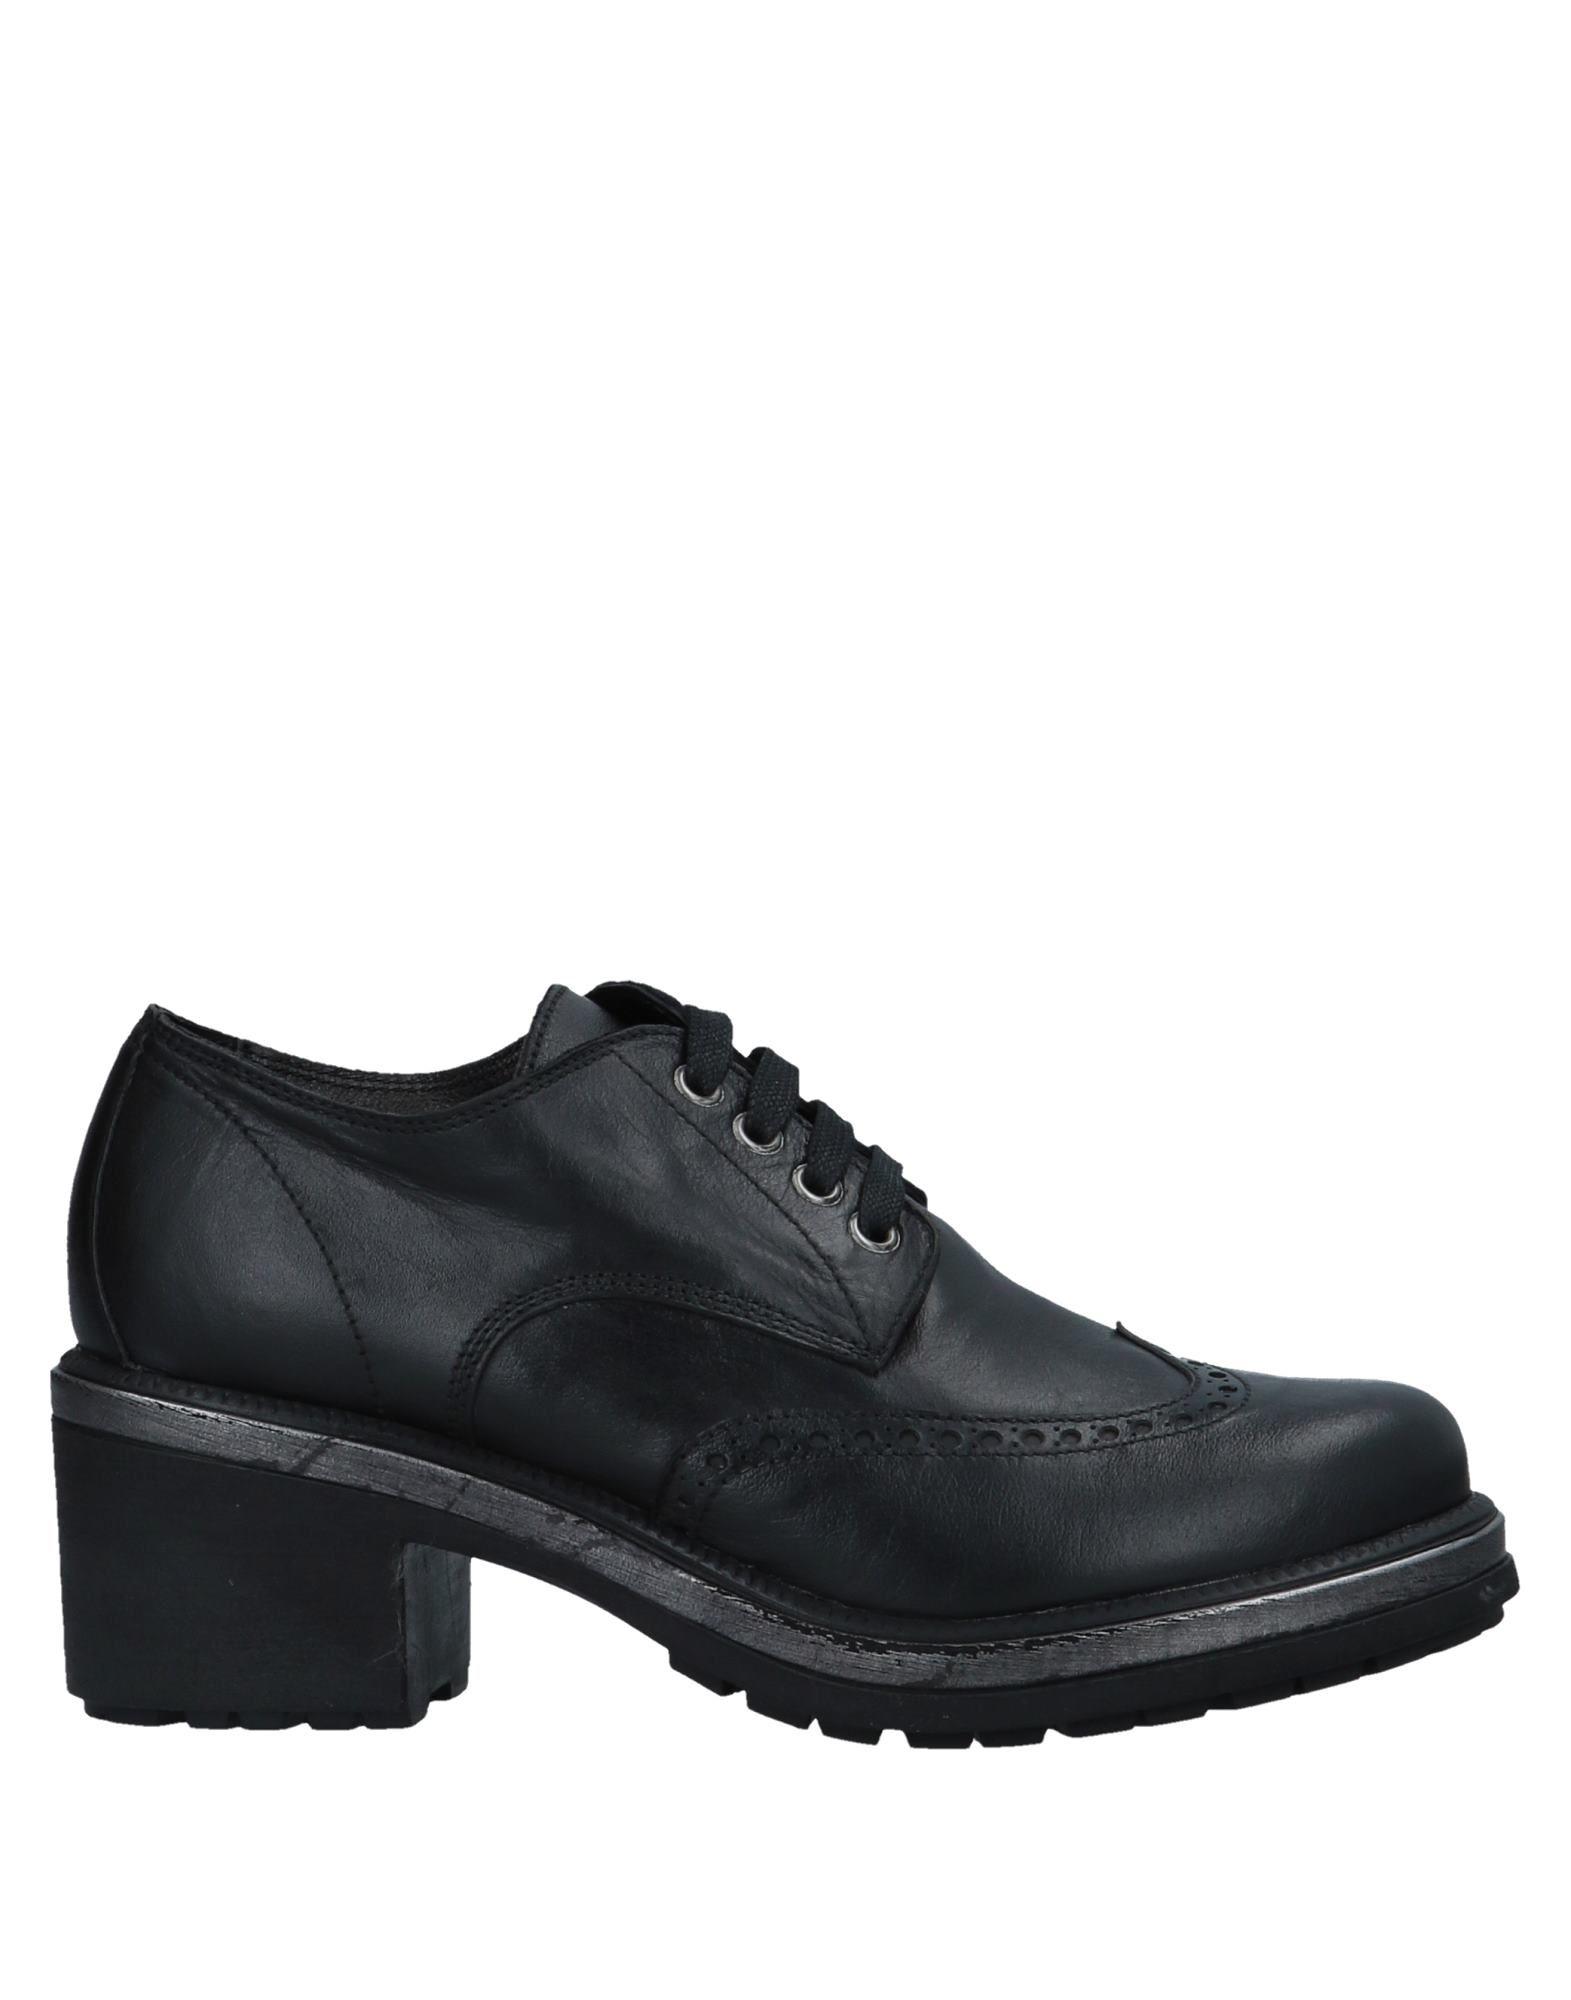 POLICE 883 Обувь на шнурках police 883 обувь на шнурках